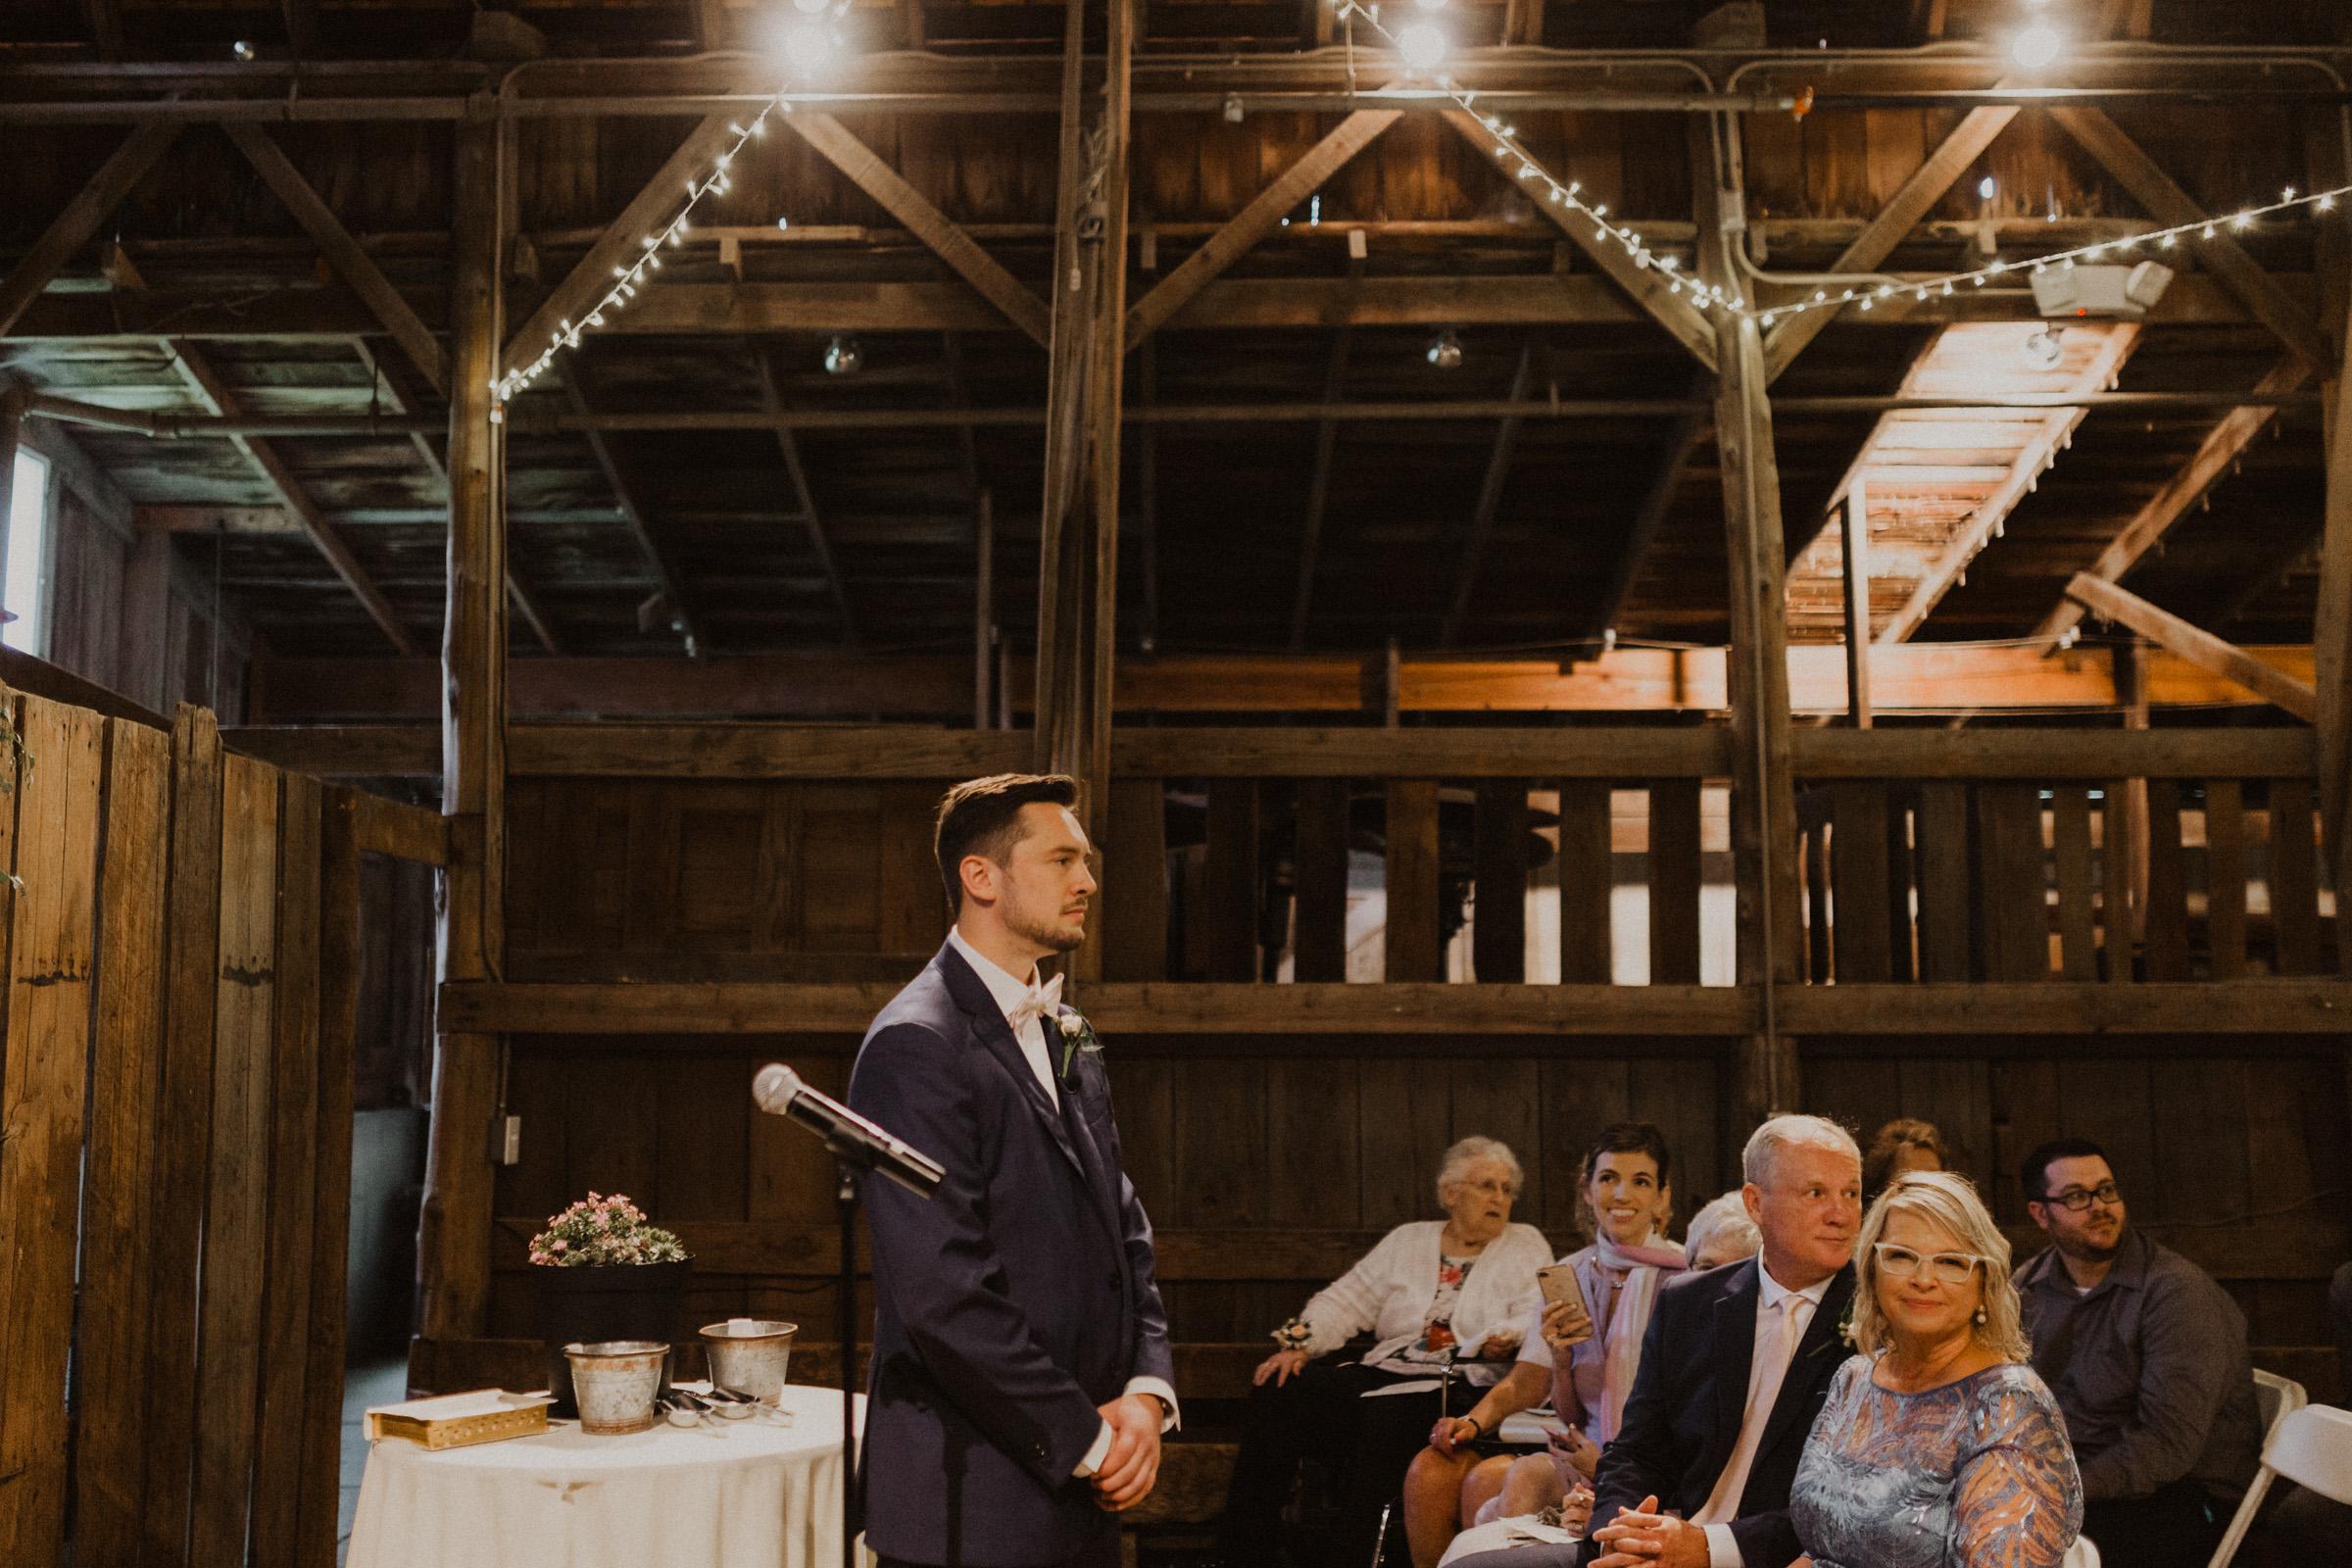 alyssa barletter photography nelson wedding nebraska city lied lodge morton barn spring wedding photographer-33.jpg